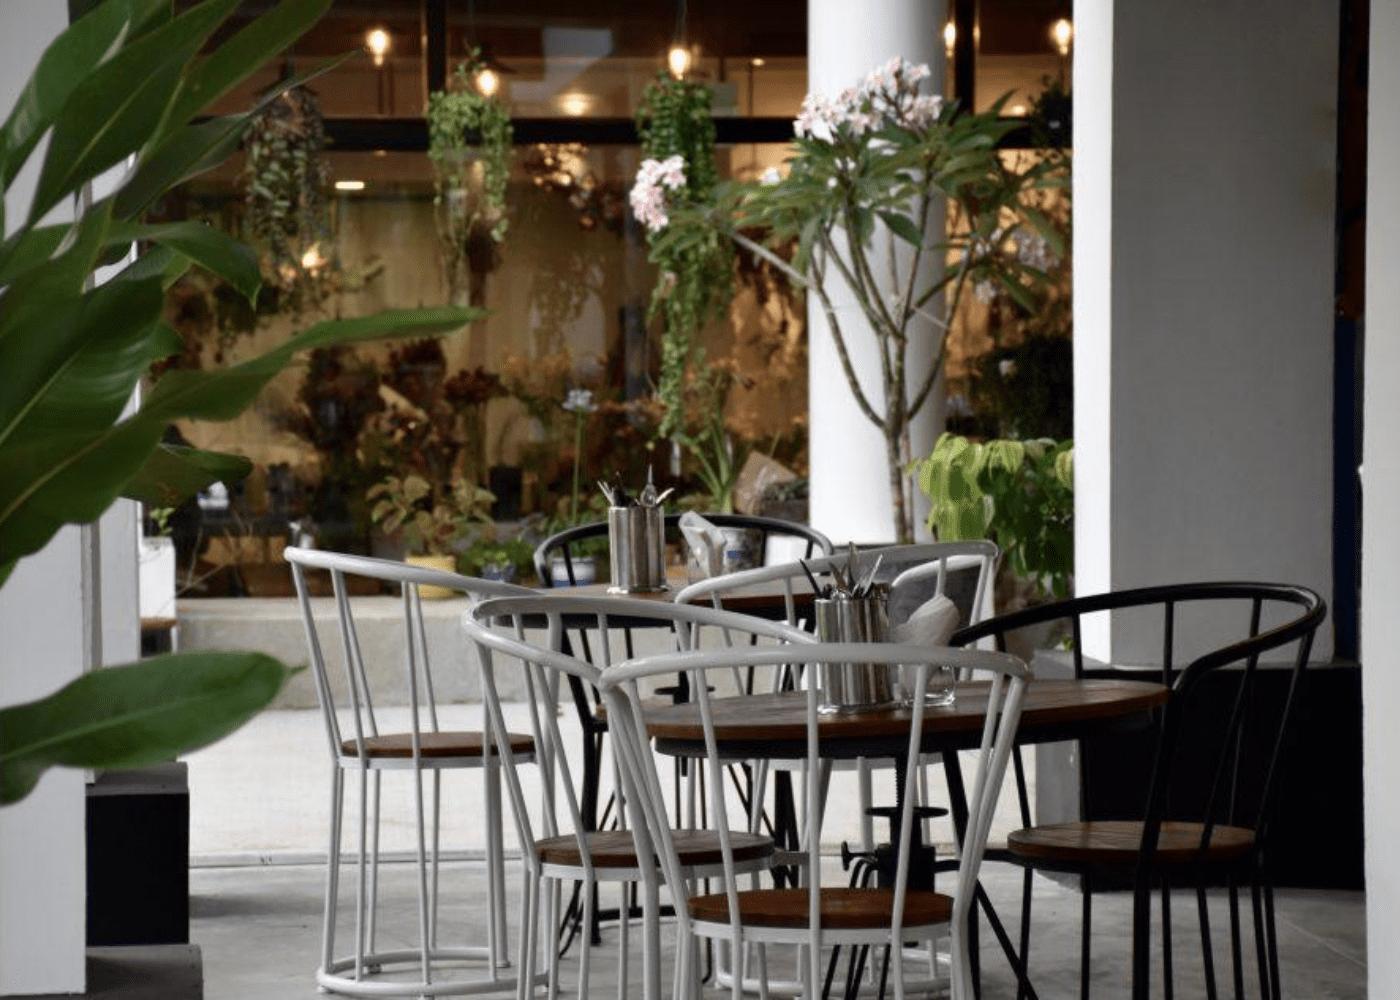 wildseed cafe | garden cafes